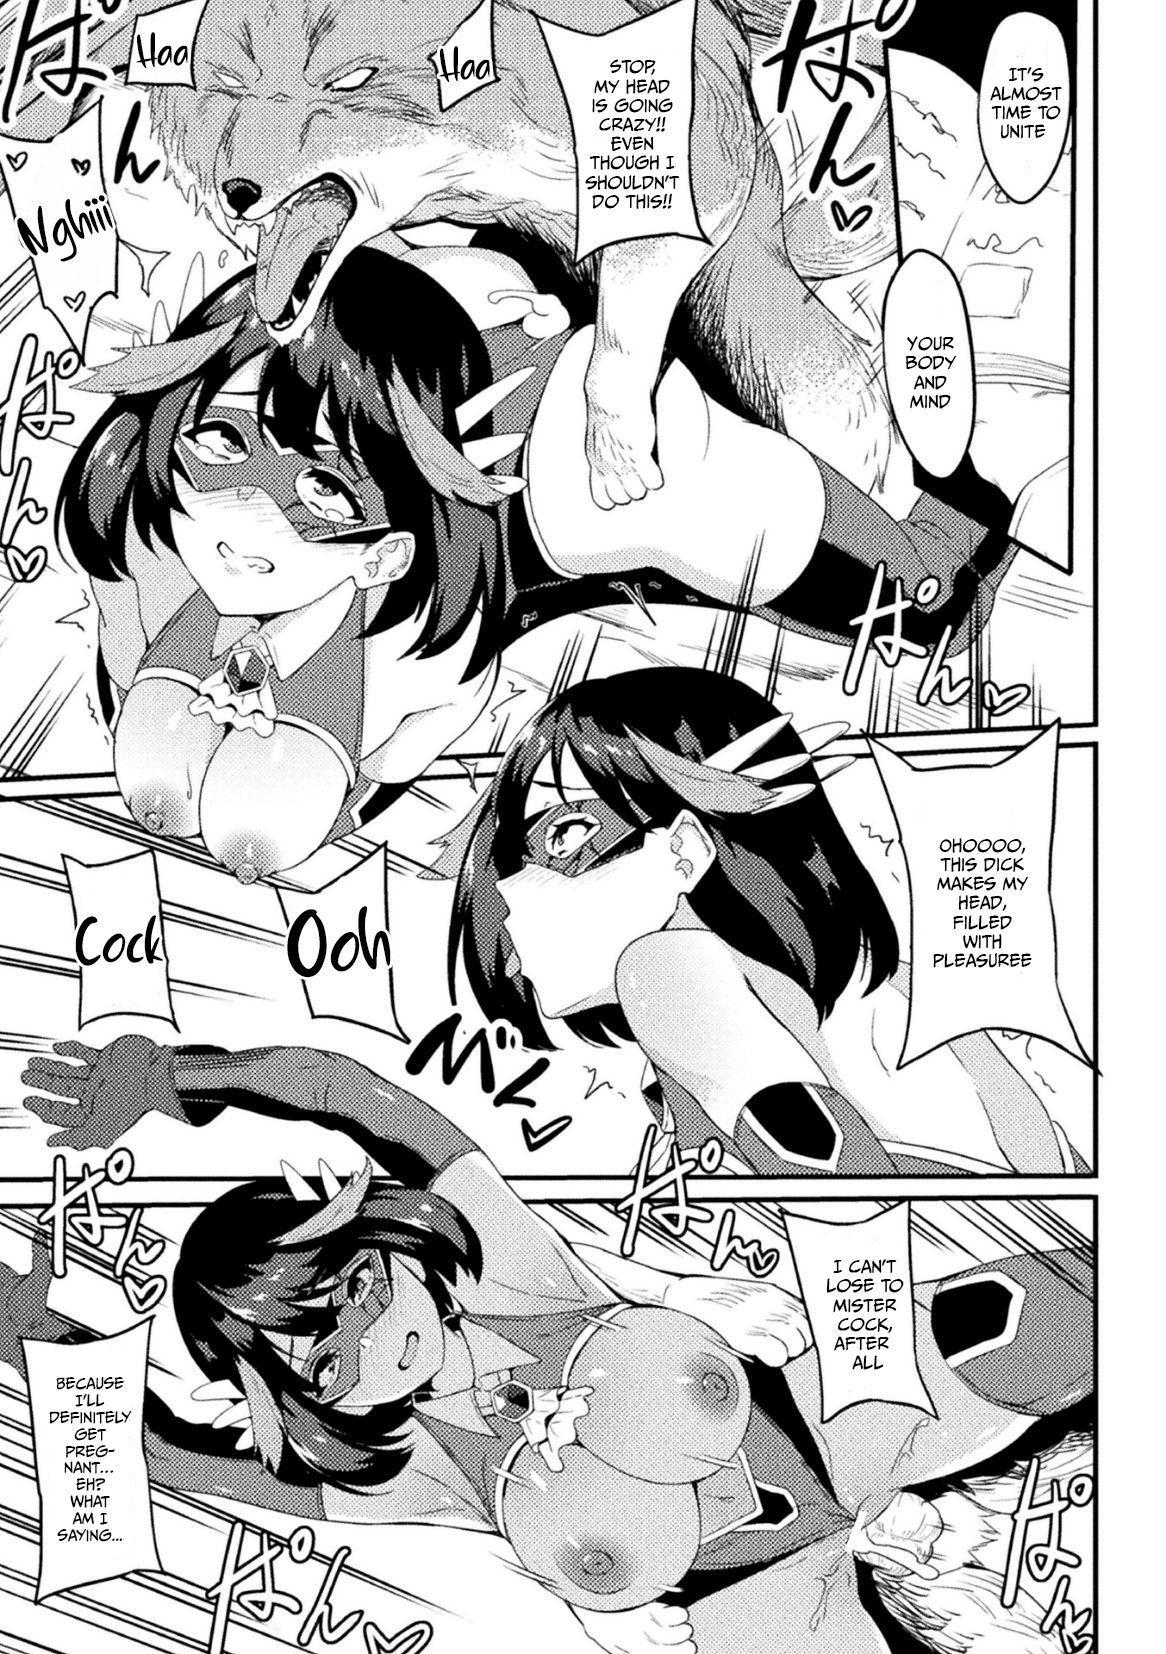 [Rinsun] Power Girl ~JK Super Heroine no Saiin Darakuki~ Ch. 2|Power Girl ~JK Super Heroine's Aphrodisiac Corruption Record~ Ch. 2 [English] [Neraka Translations] 22